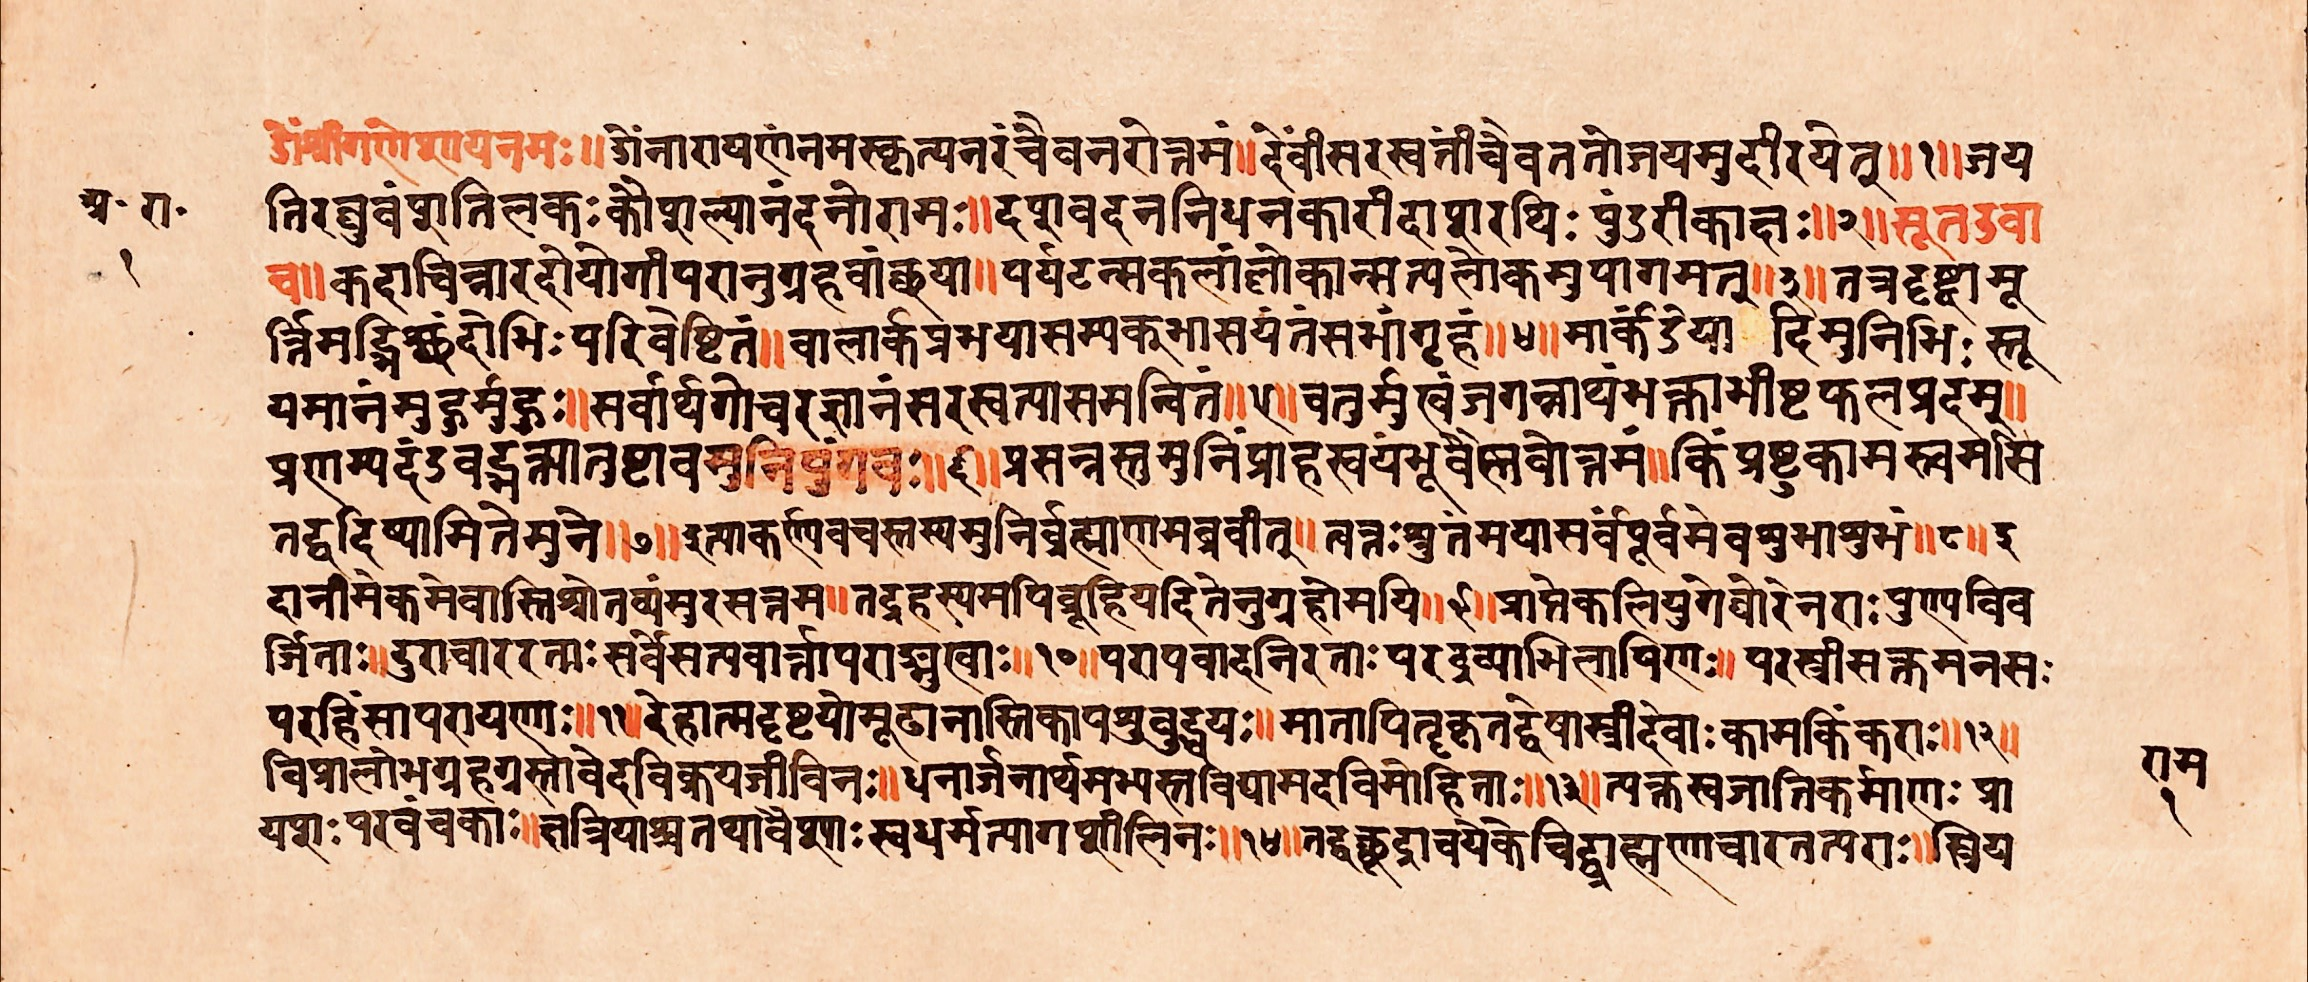 Brahmanda Purana - Wikipedia